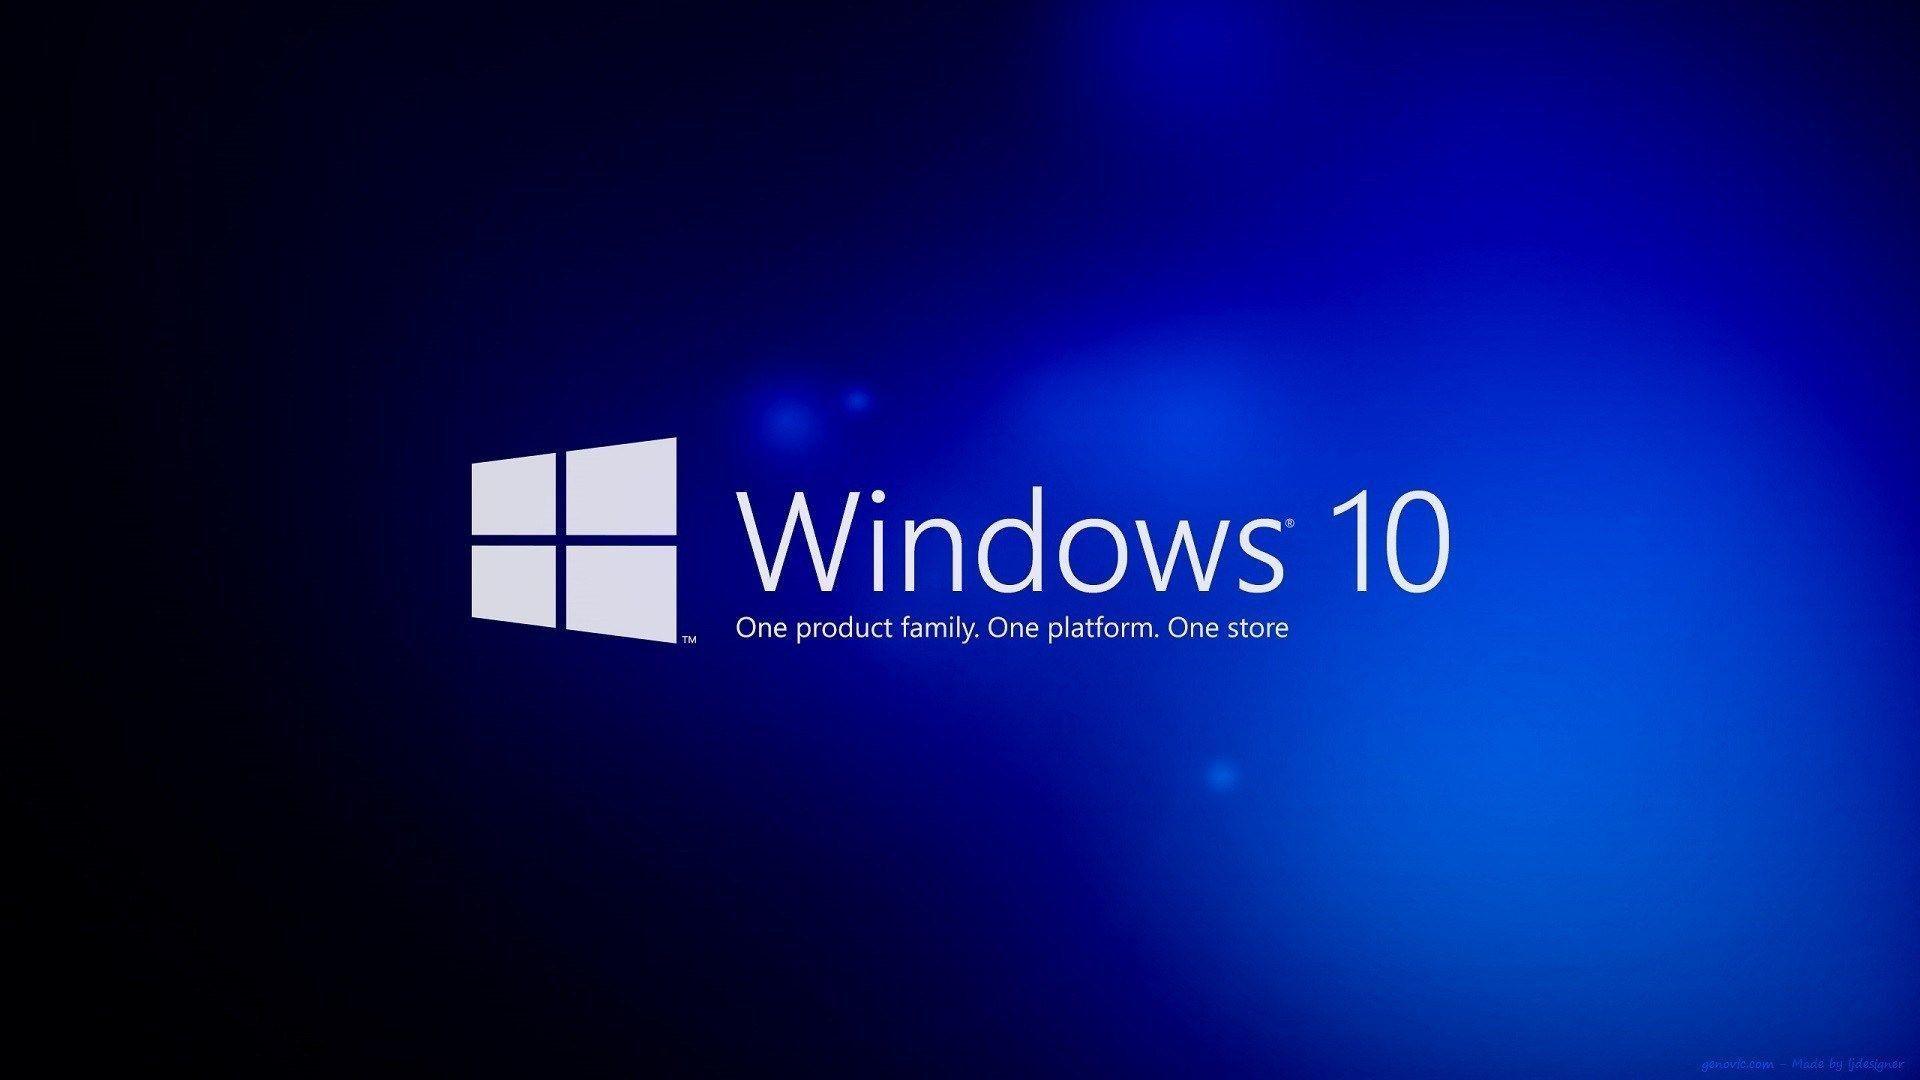 Unique Desktop Wallpaper Hd 1920x1080 Windows 10 Windows10 Unique Desktop Wallpaper Hd 1920x1080 Wi Wallpaper Windows 10 Windows 10 Background Windows 10 Logo